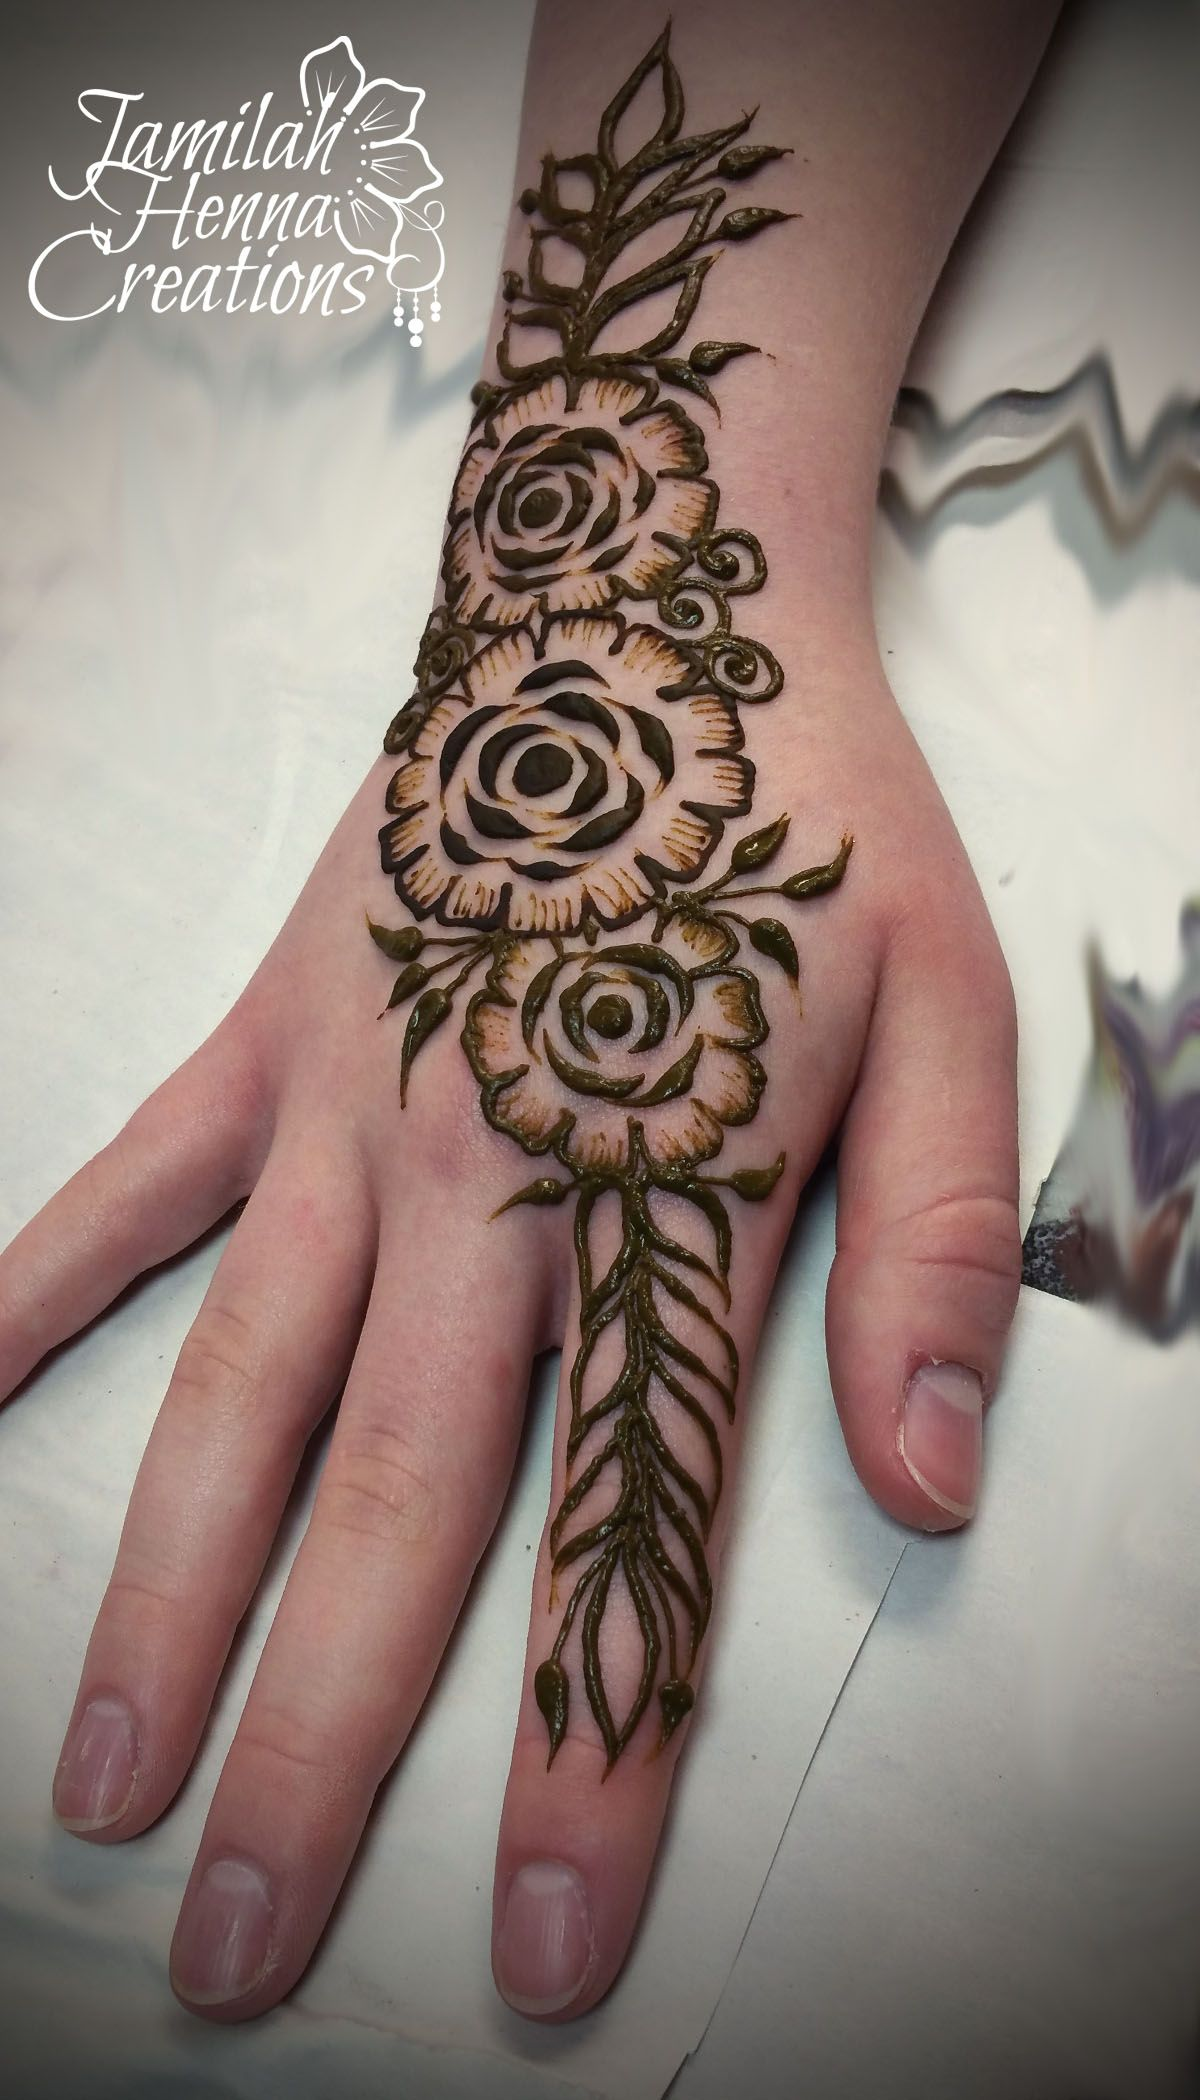 Gulf Rose Henna Www Jamilahhennacreations Com Henna Henna Henna